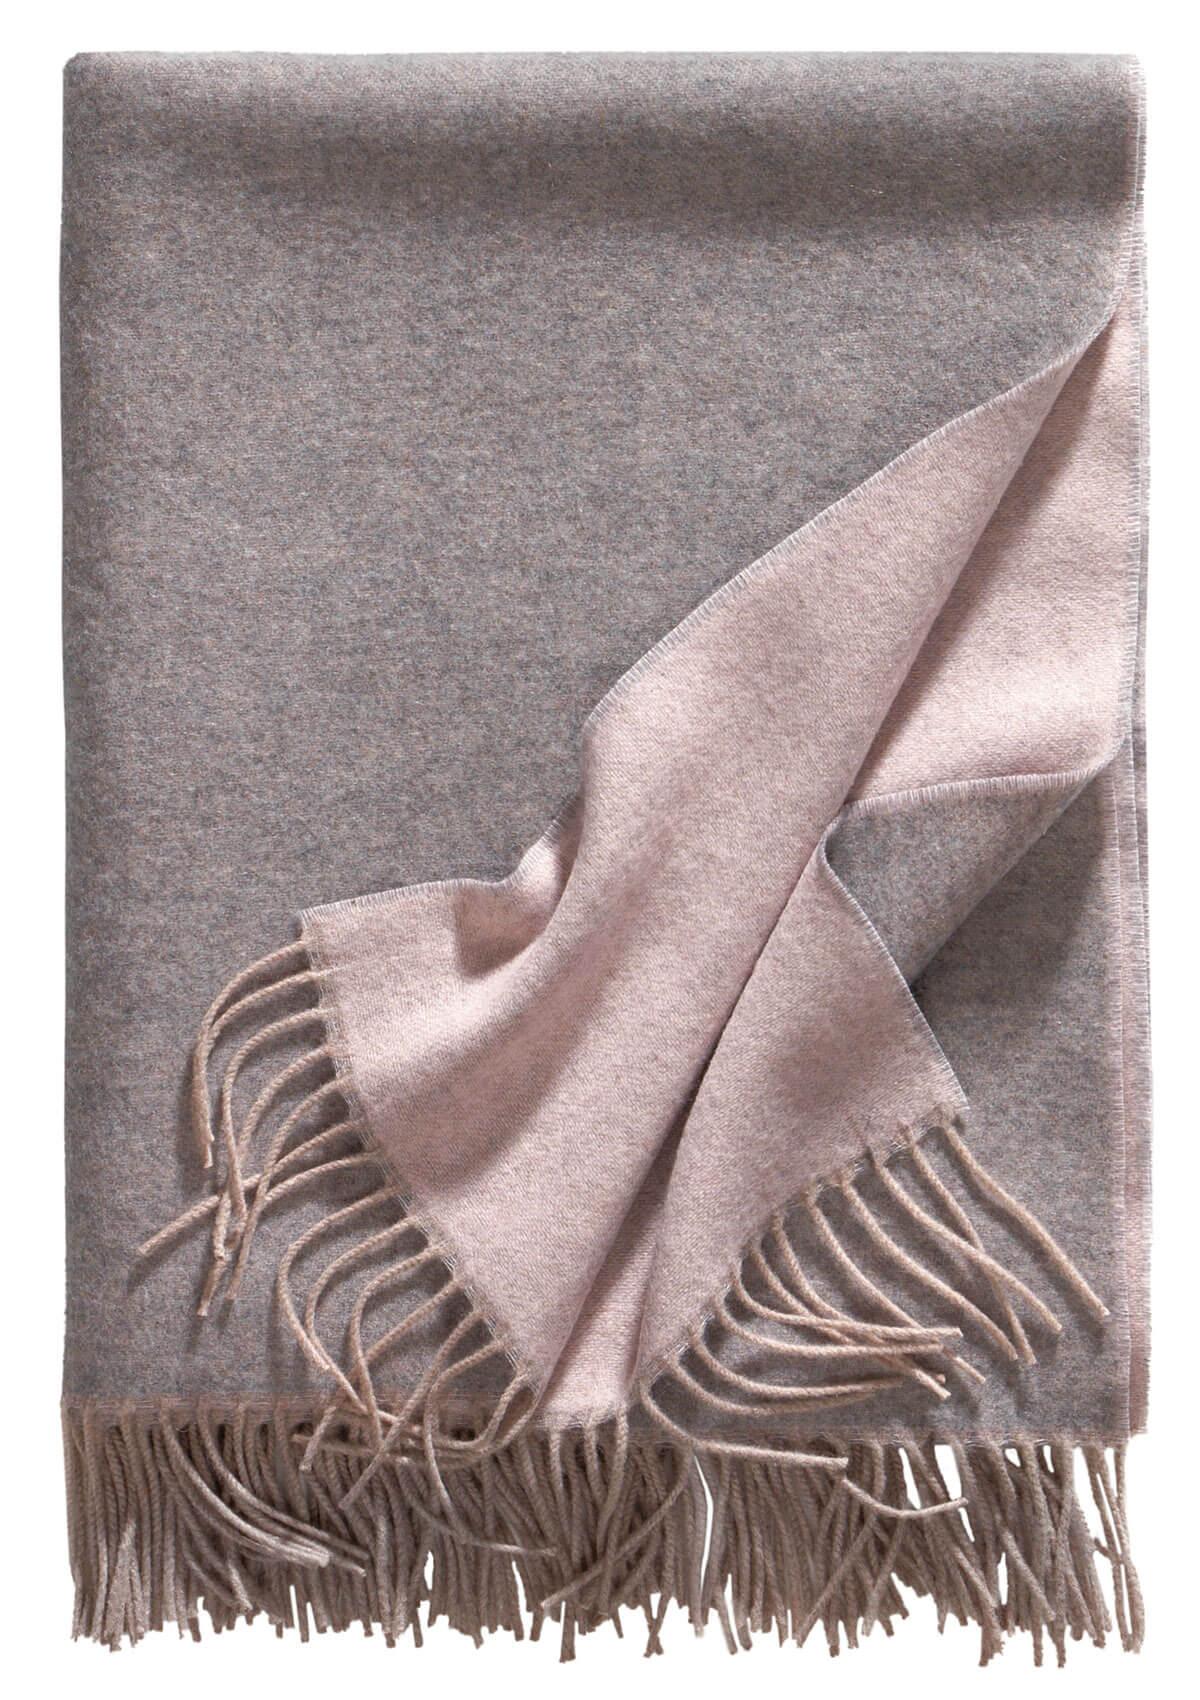 Bild von Alassio_rosa_silber_soft_cashmere_decke_100, Variante grau-rosa